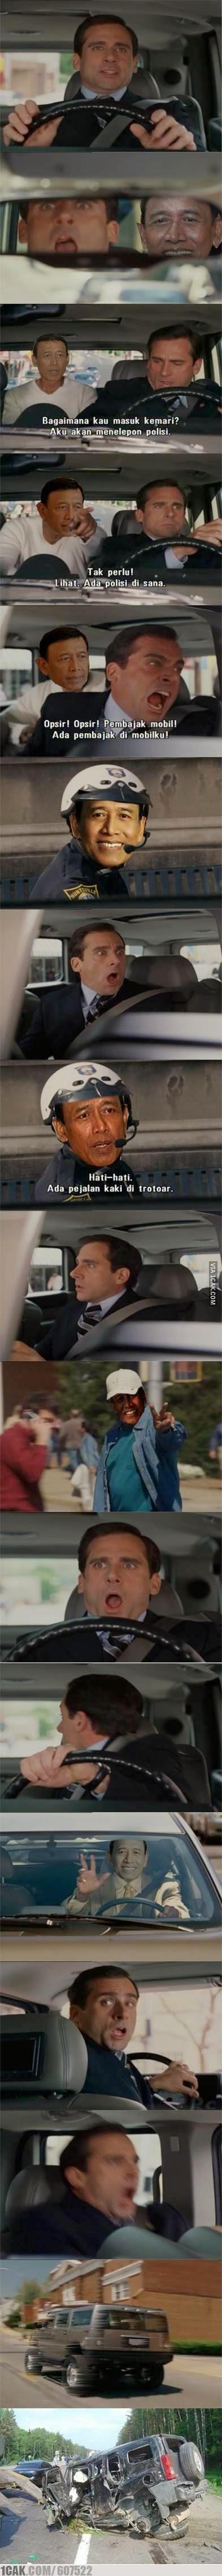 Meme Lucu Wiranto Menyamar 9